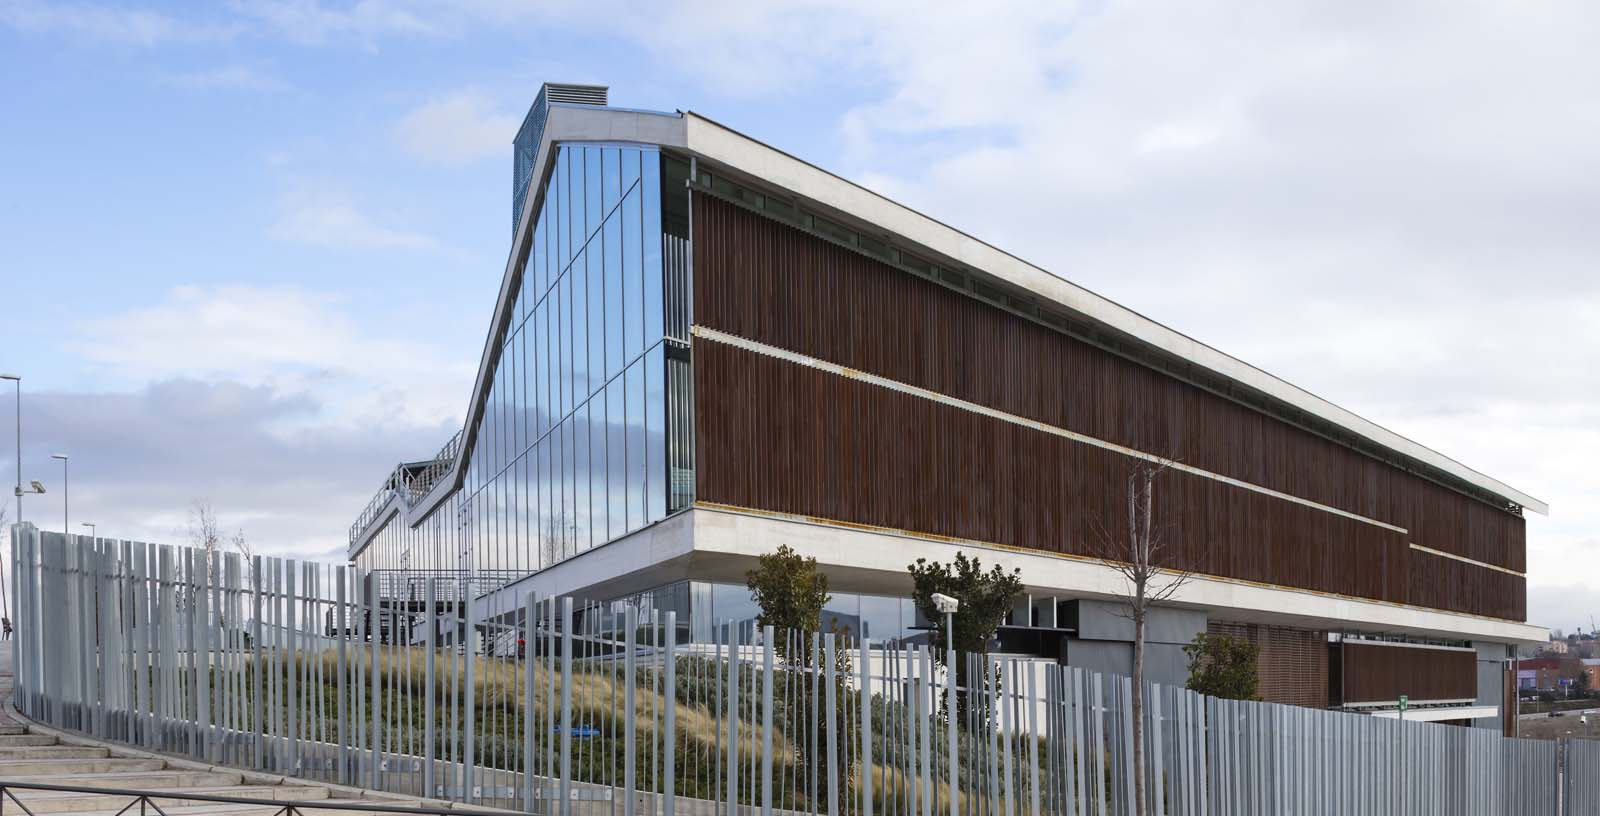 Docalia_Data_Centre_ppal_Architecture_IDOM_copyright_Miguel_de_Guzman